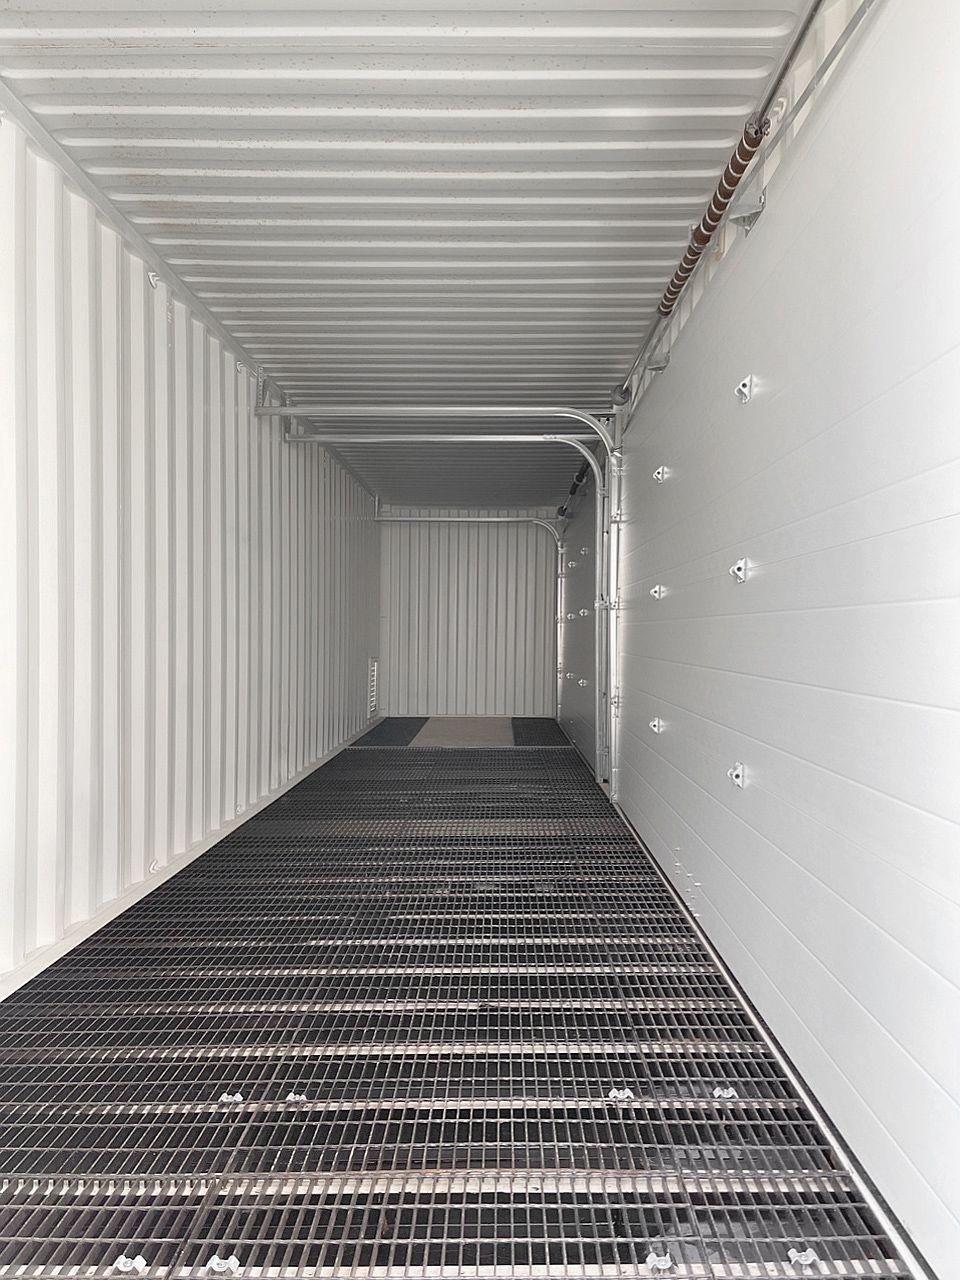 40'HC HAZCON Containment unit w/ Overhead doors - Custom Cubes